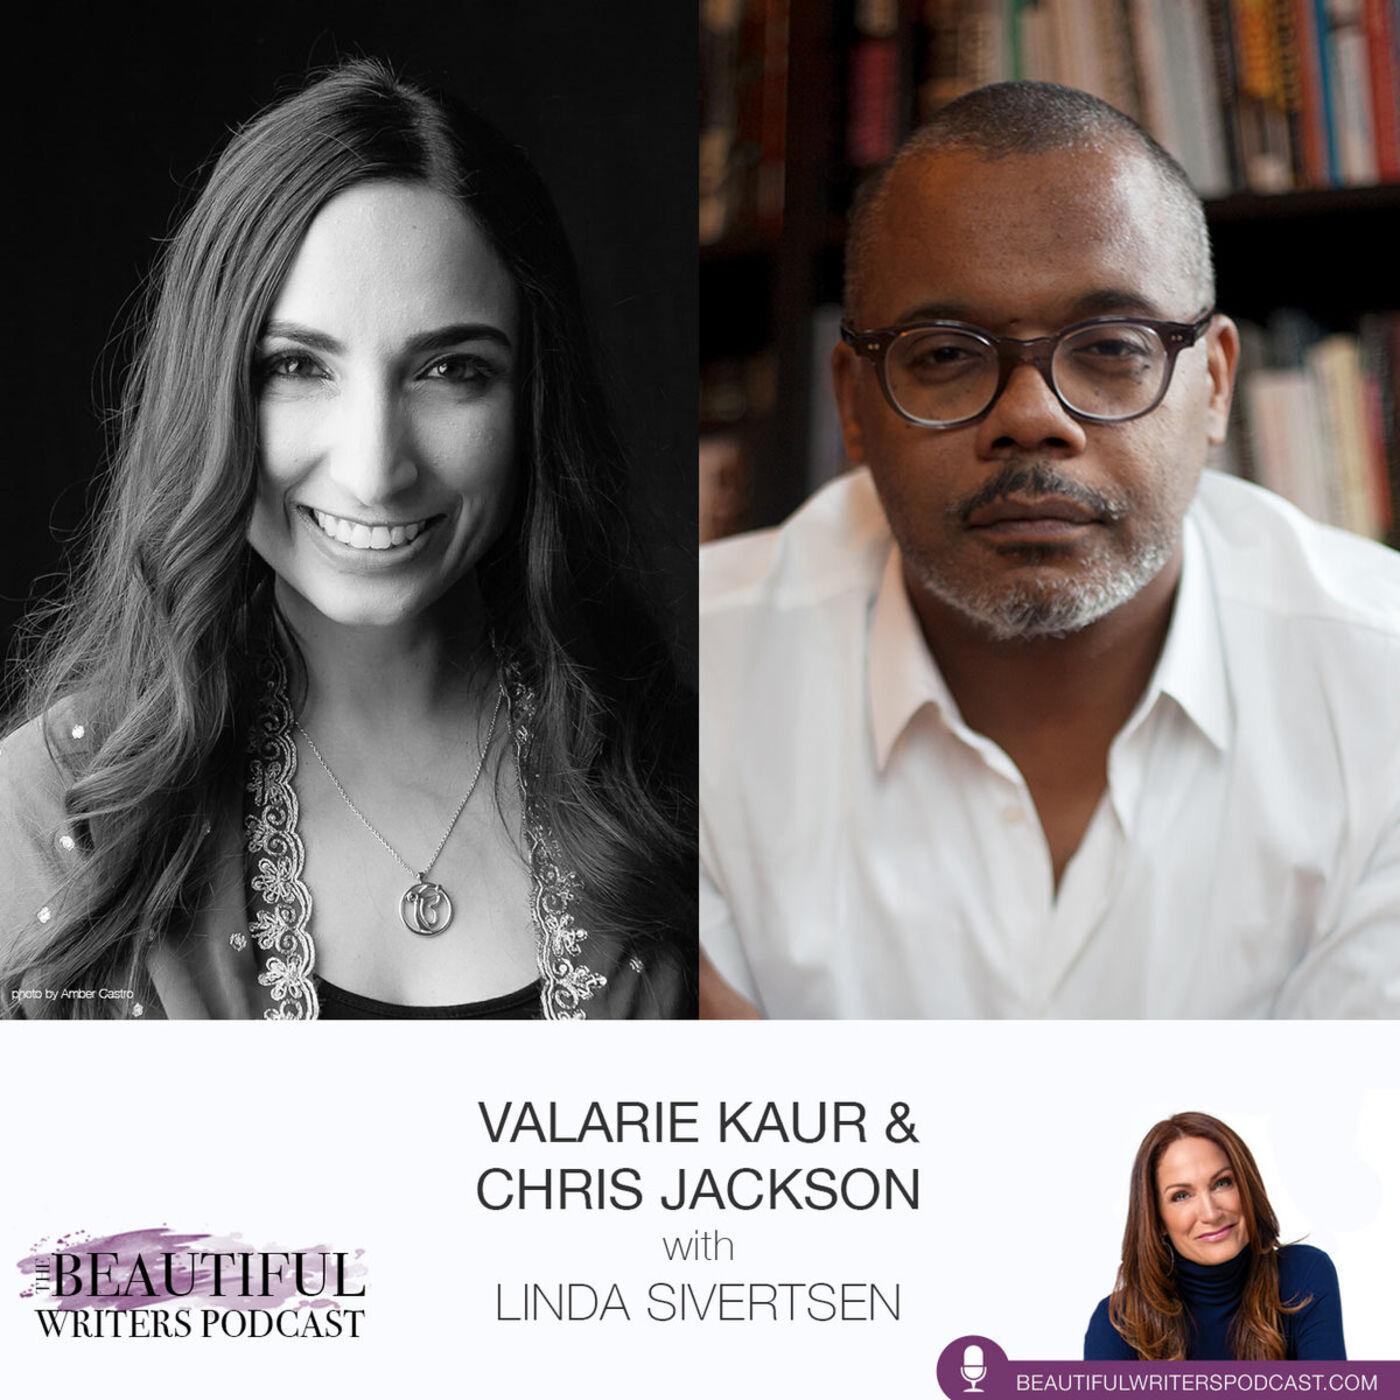 Valarie Kaur & Chris Jackson: A World-Changer and Her Superhero Publisher